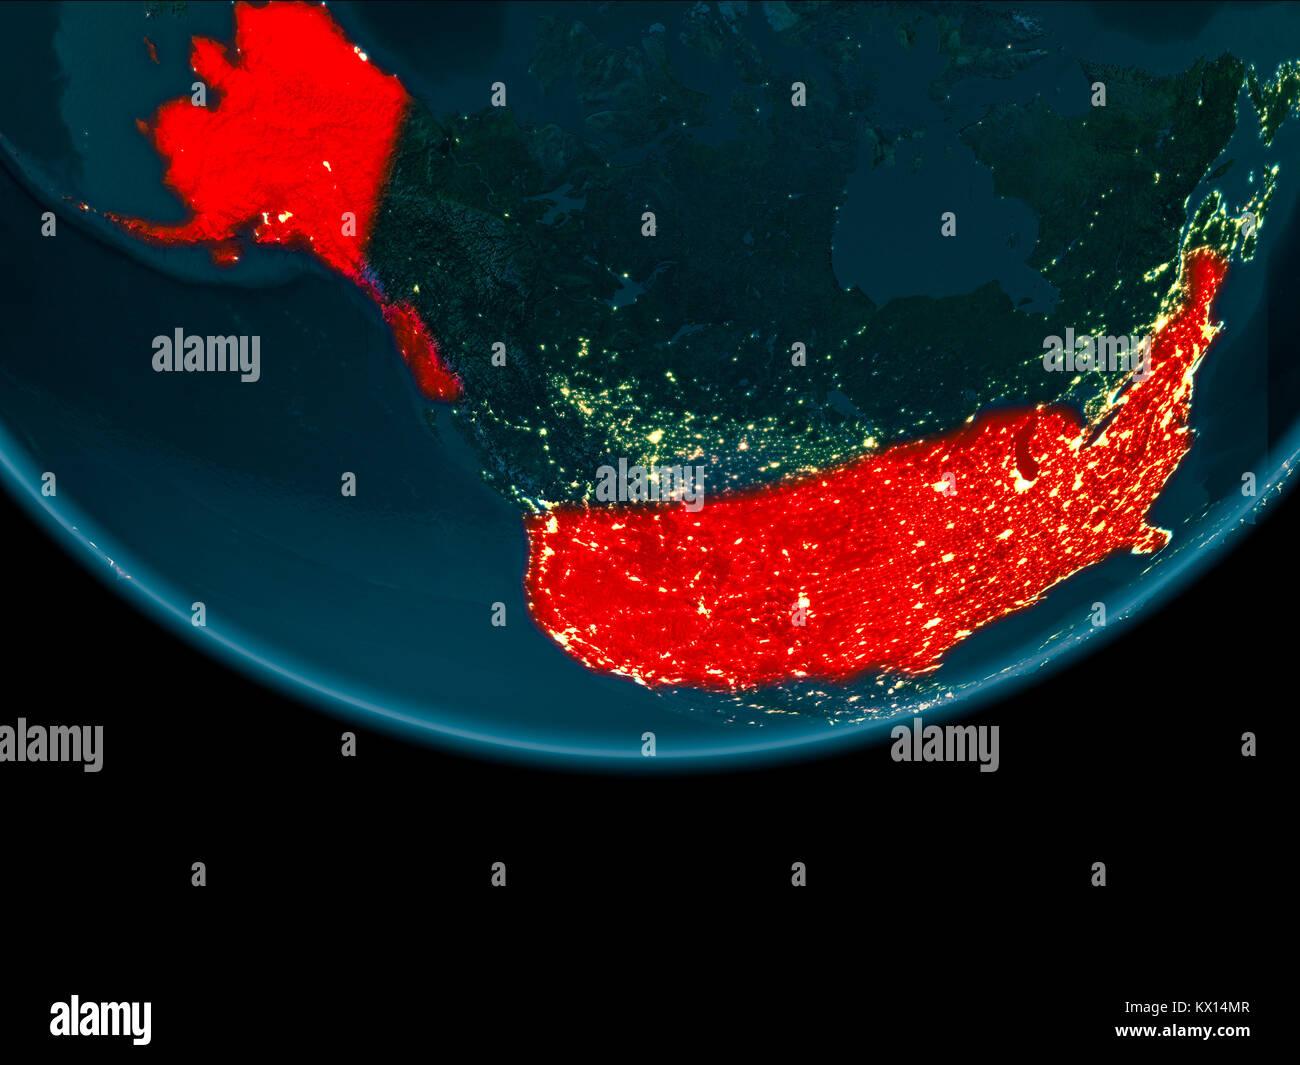 Satellite Map North America Night Stock Photos & Satellite ... on canada at night satellite, world map at night satellite, us map at night satellite,